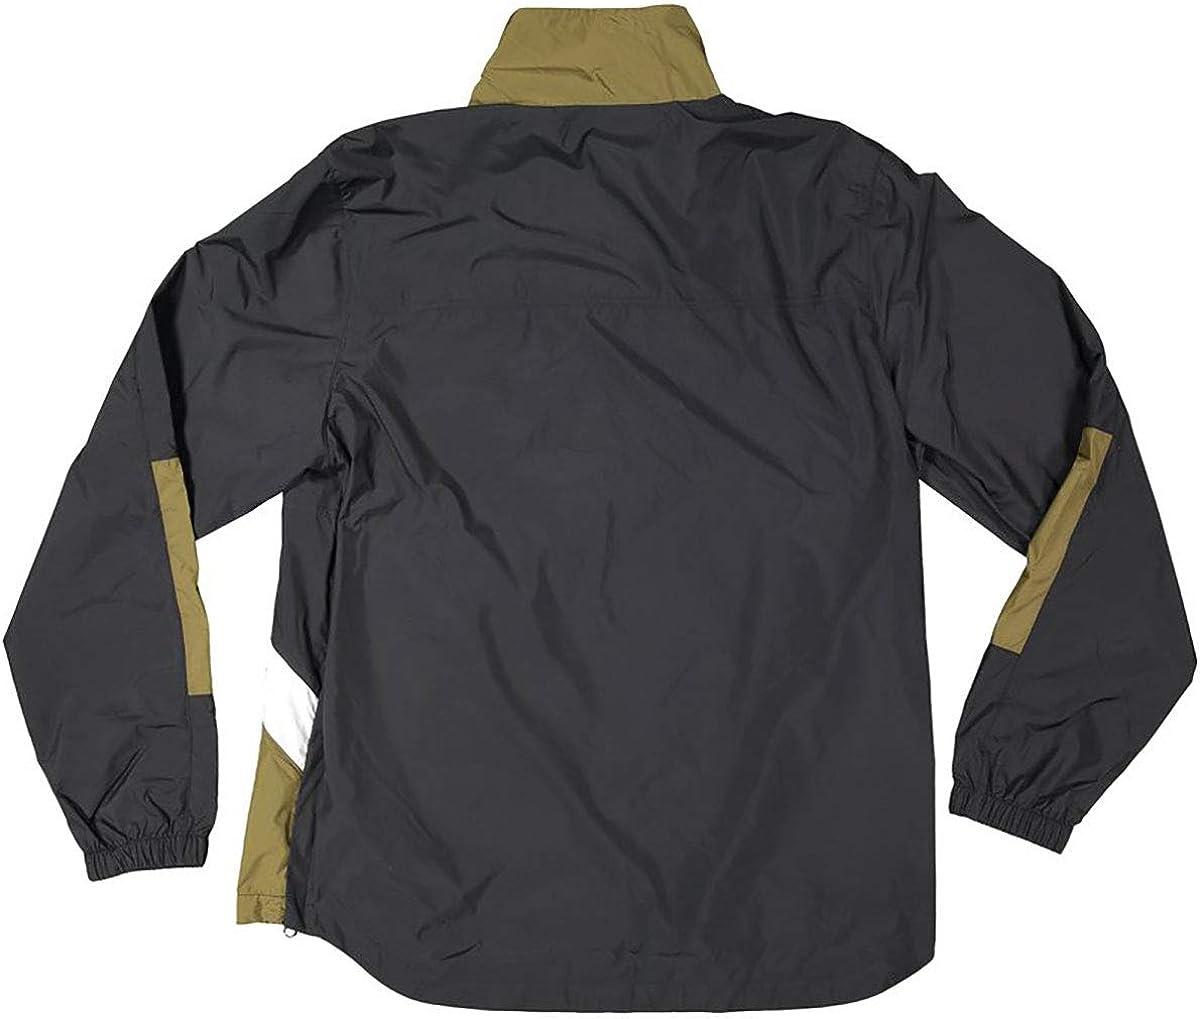 DC Men's ON The Block Anorak Jacket Black